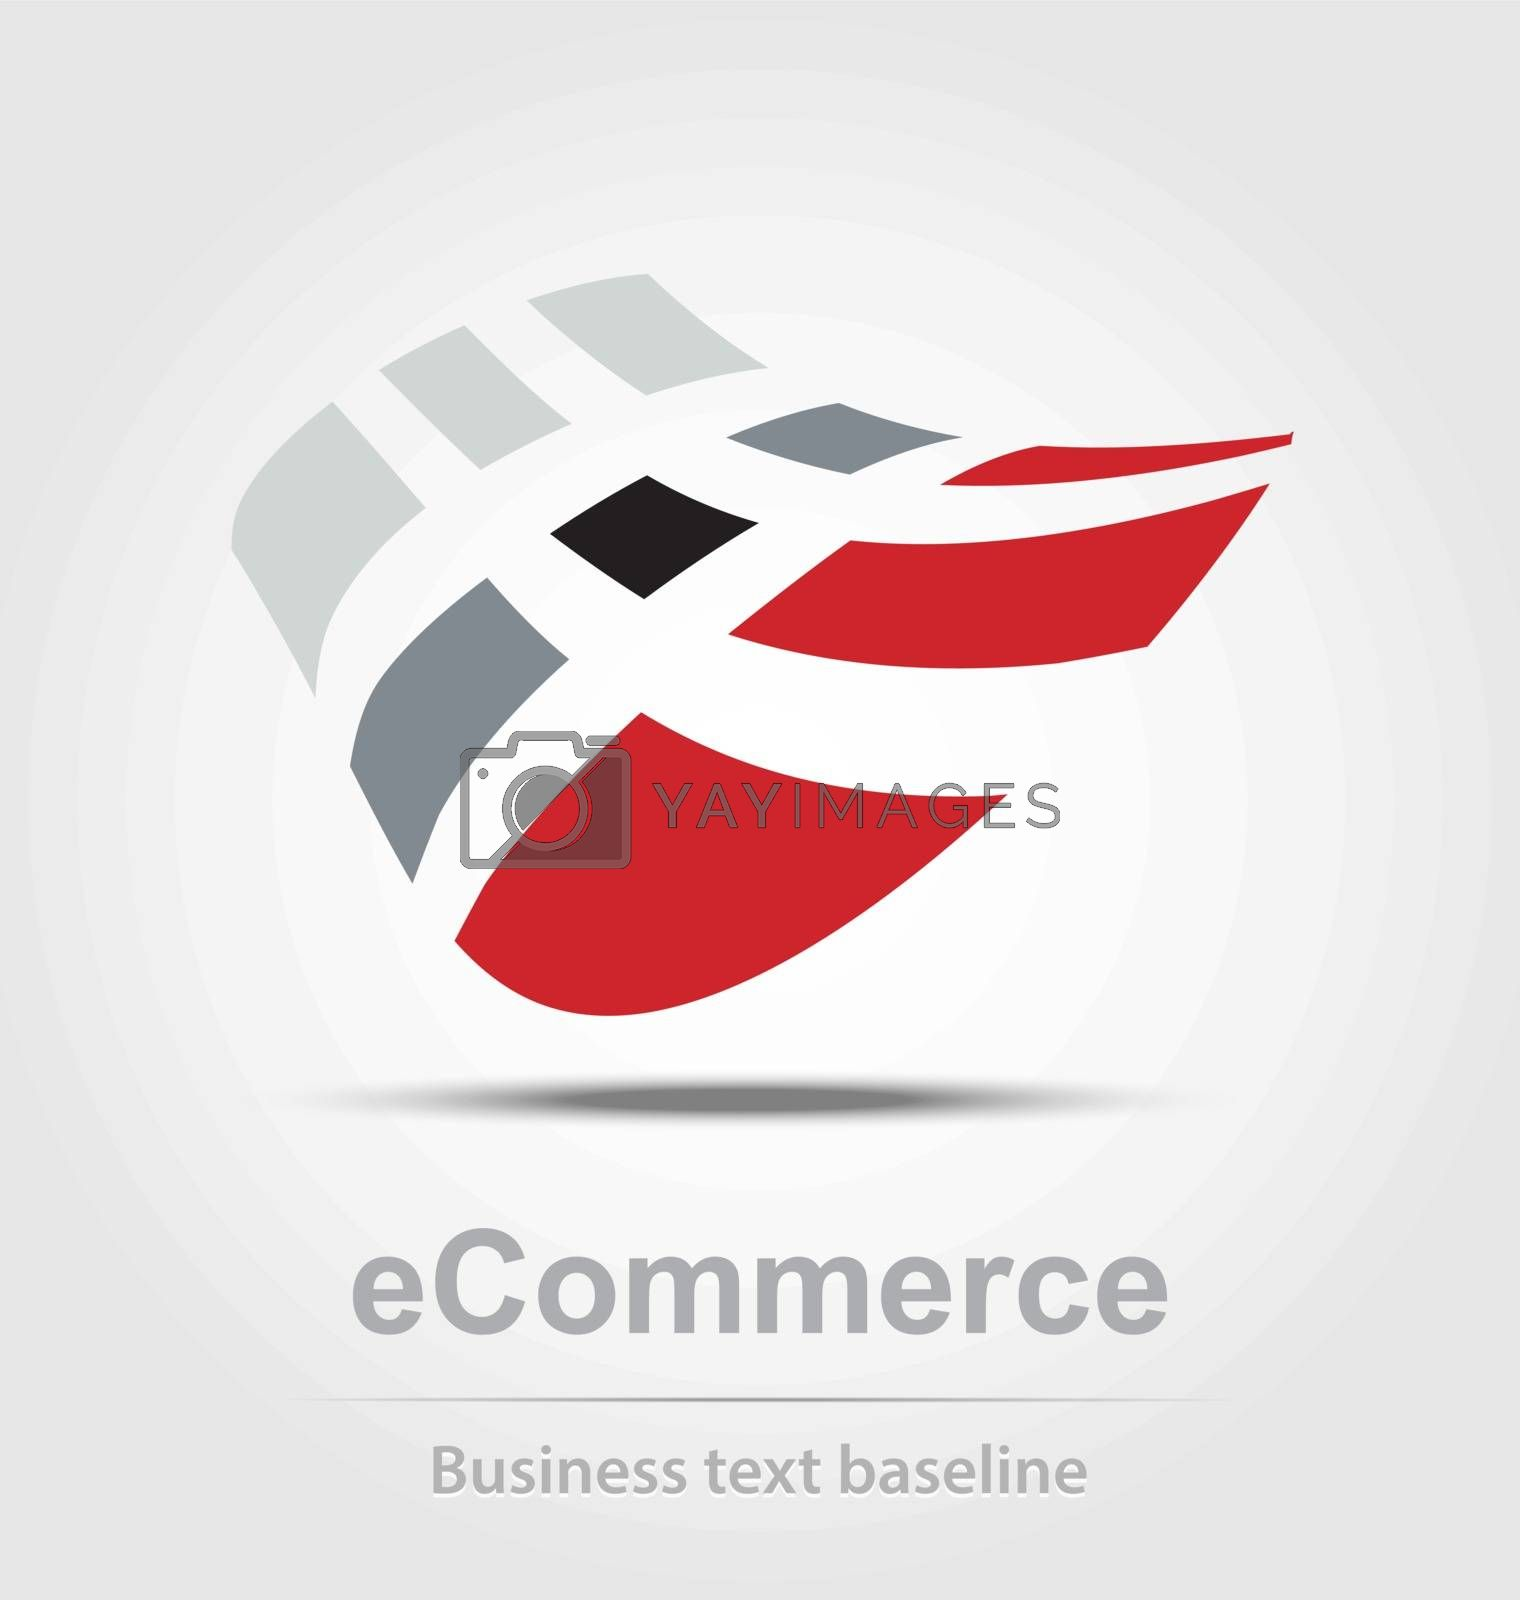 Ecommerce busines icon for creative design